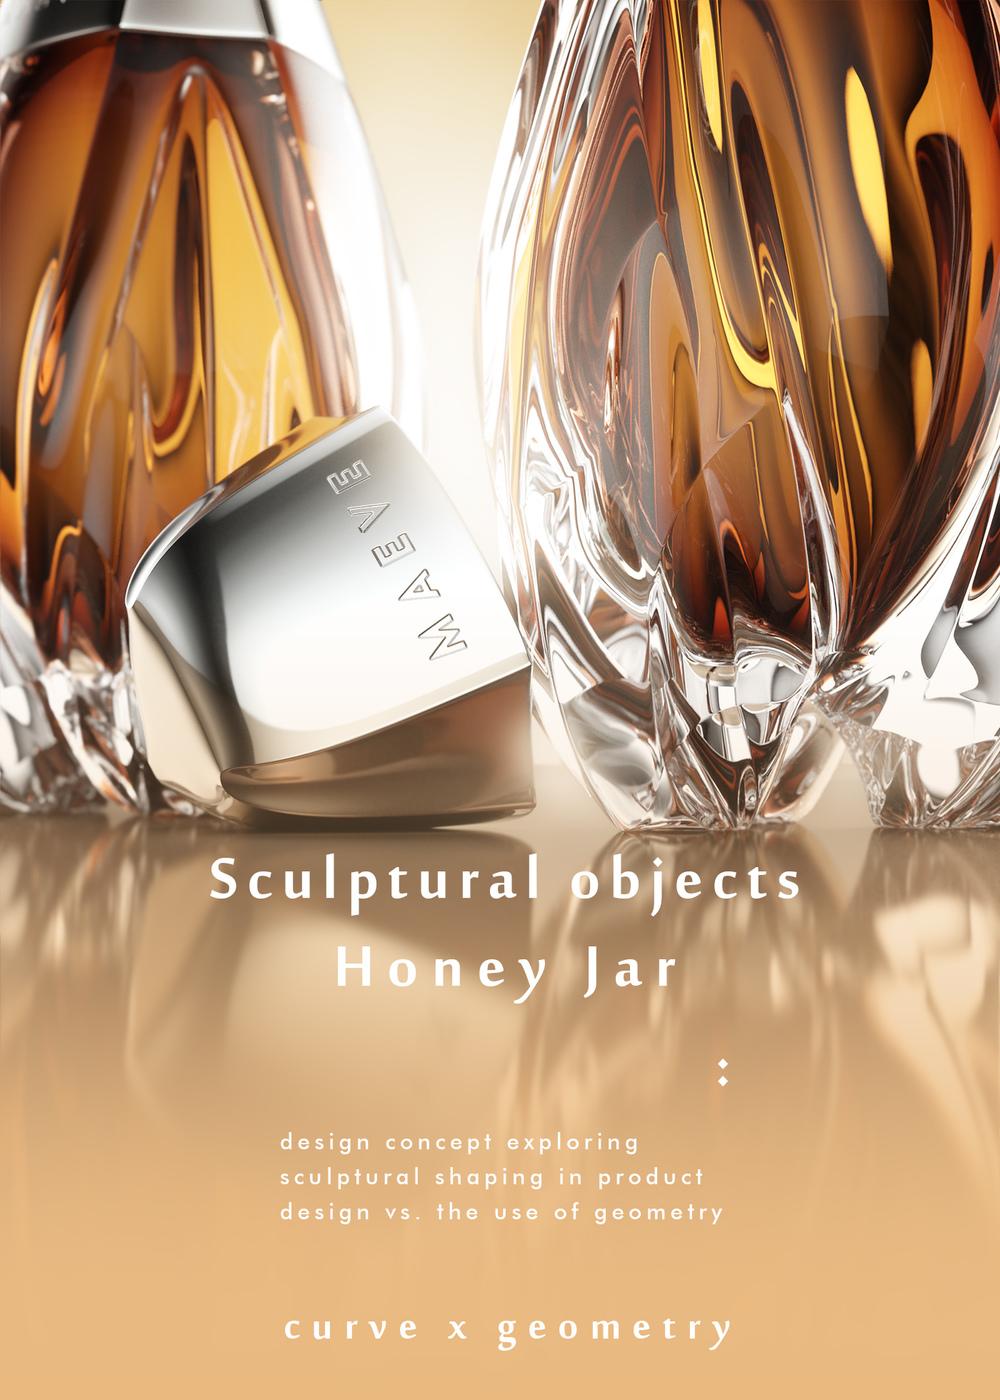 luxury honey jar